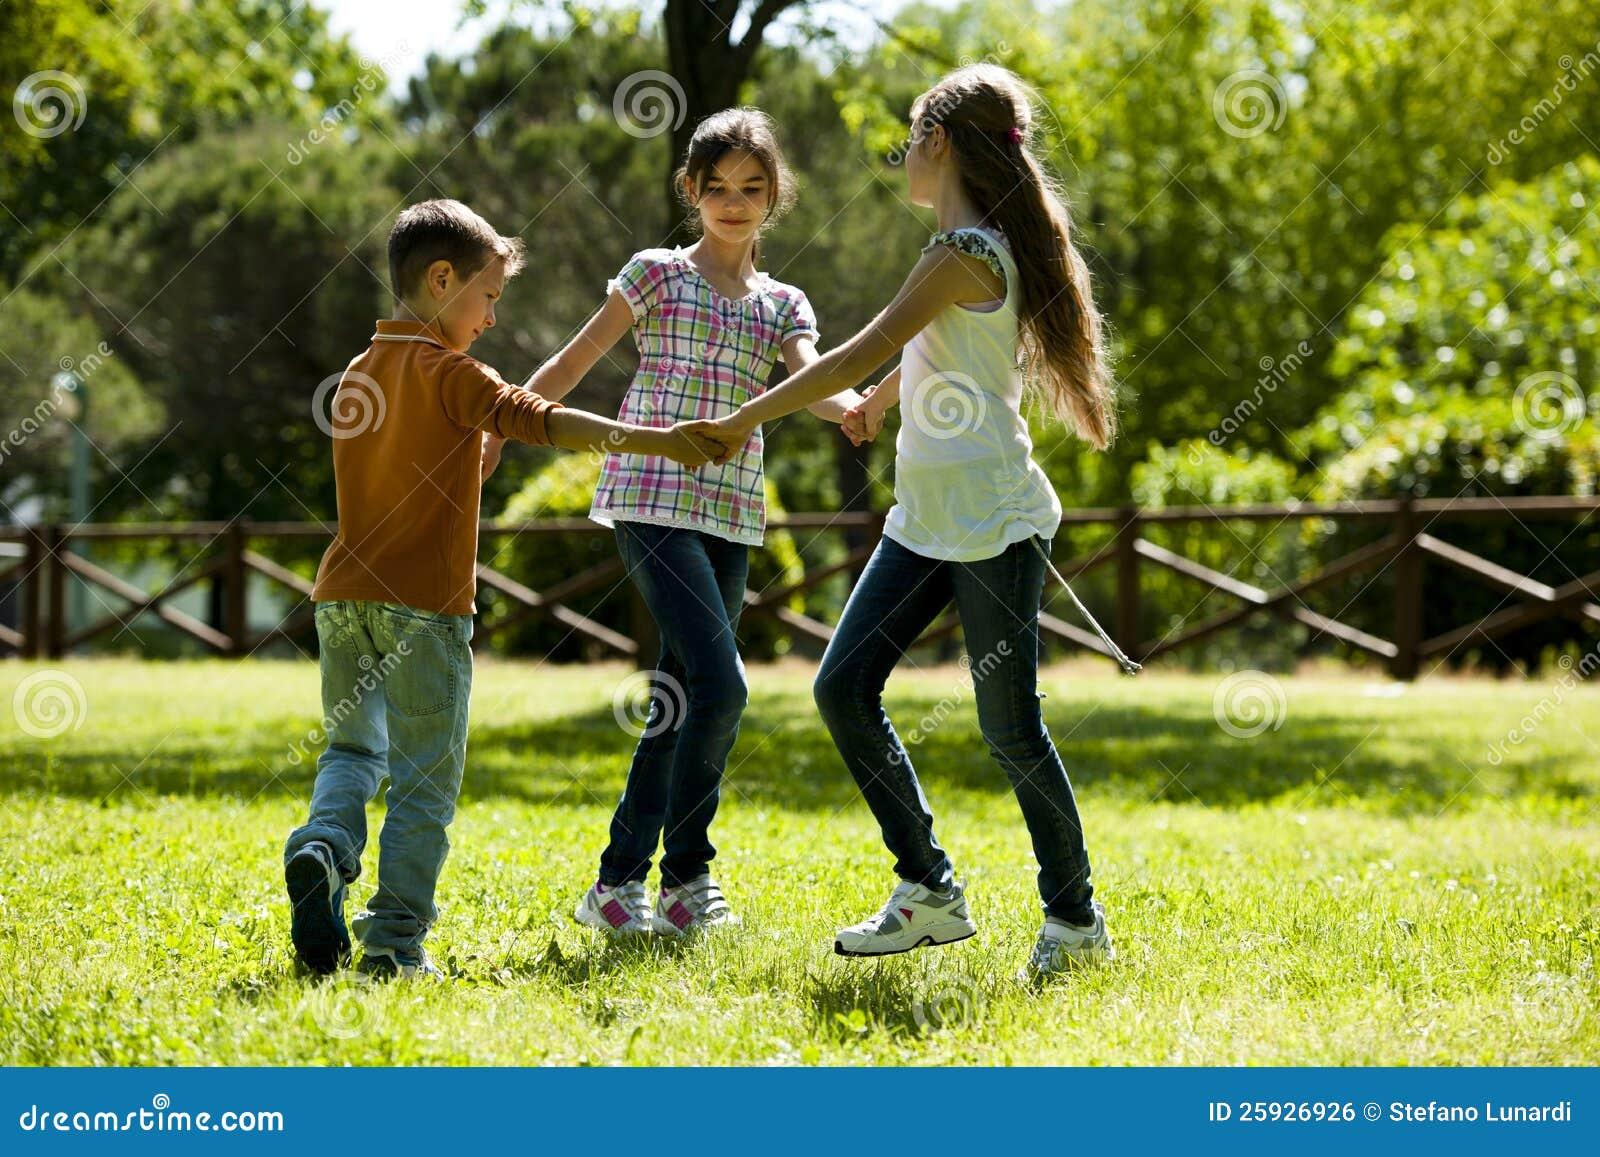 Kids Playing Ring Around The Rosie